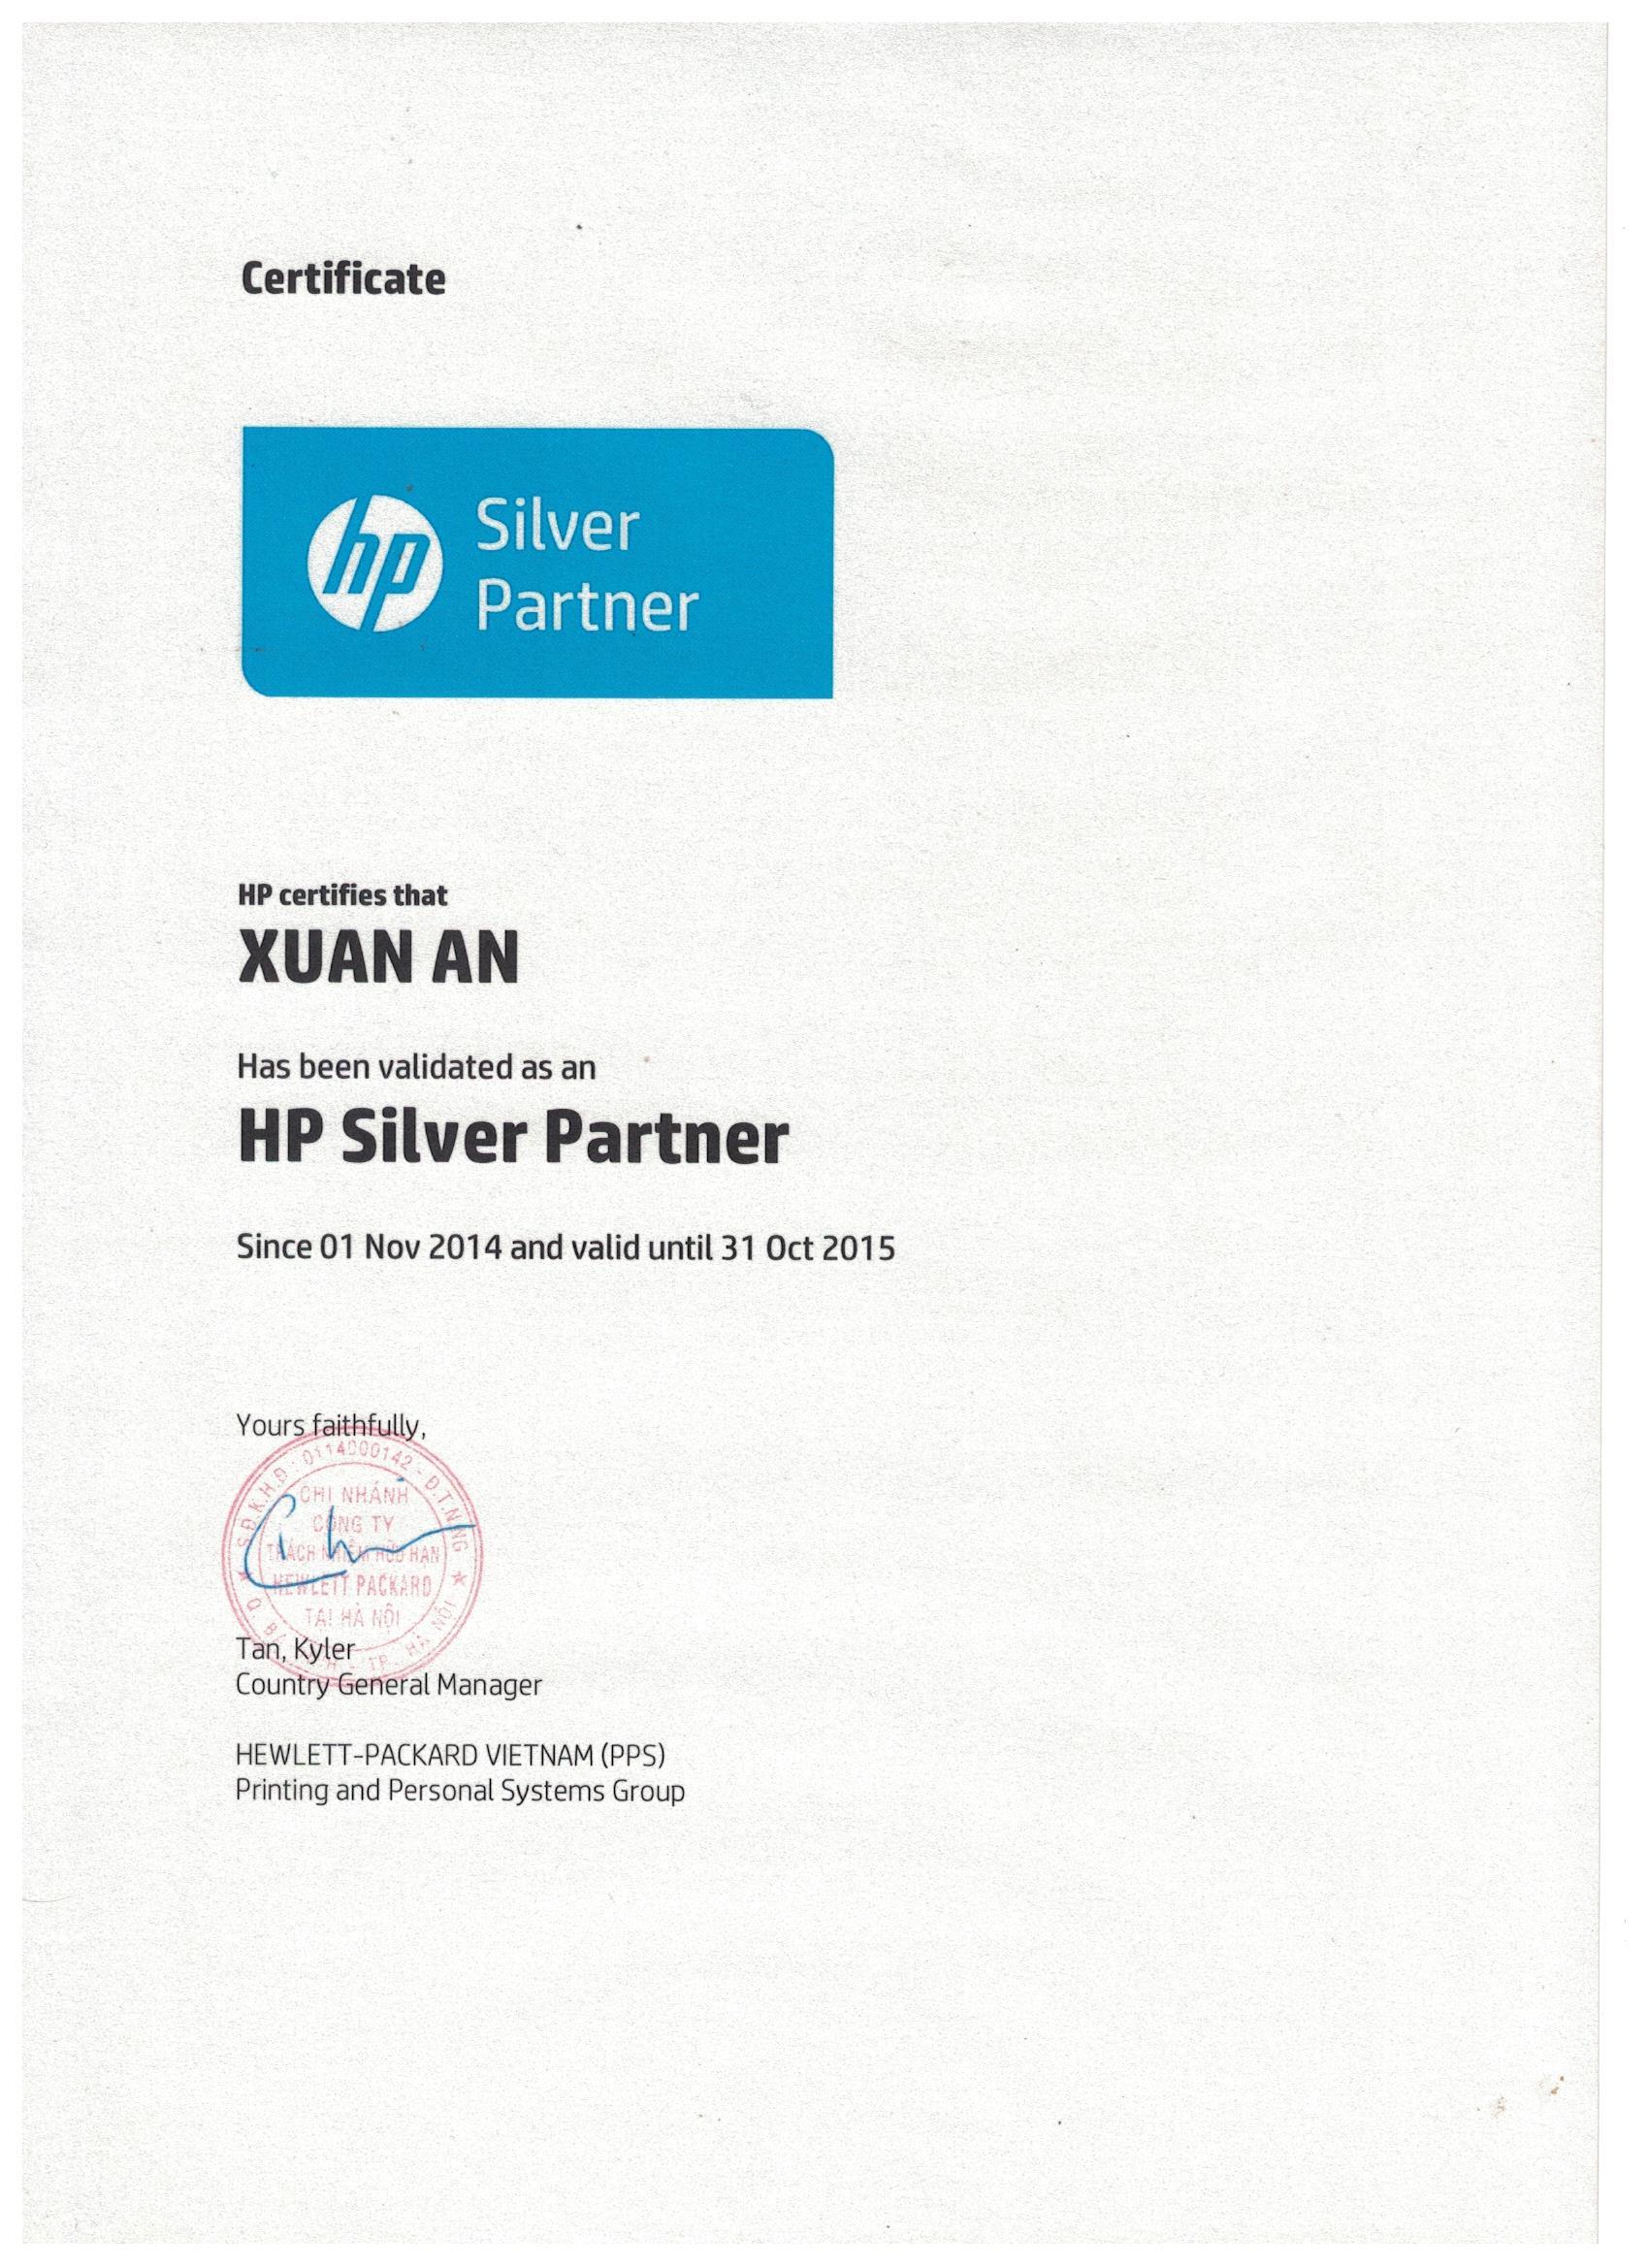 HP Probook 430 G6 - 5YM96PA (Silver)